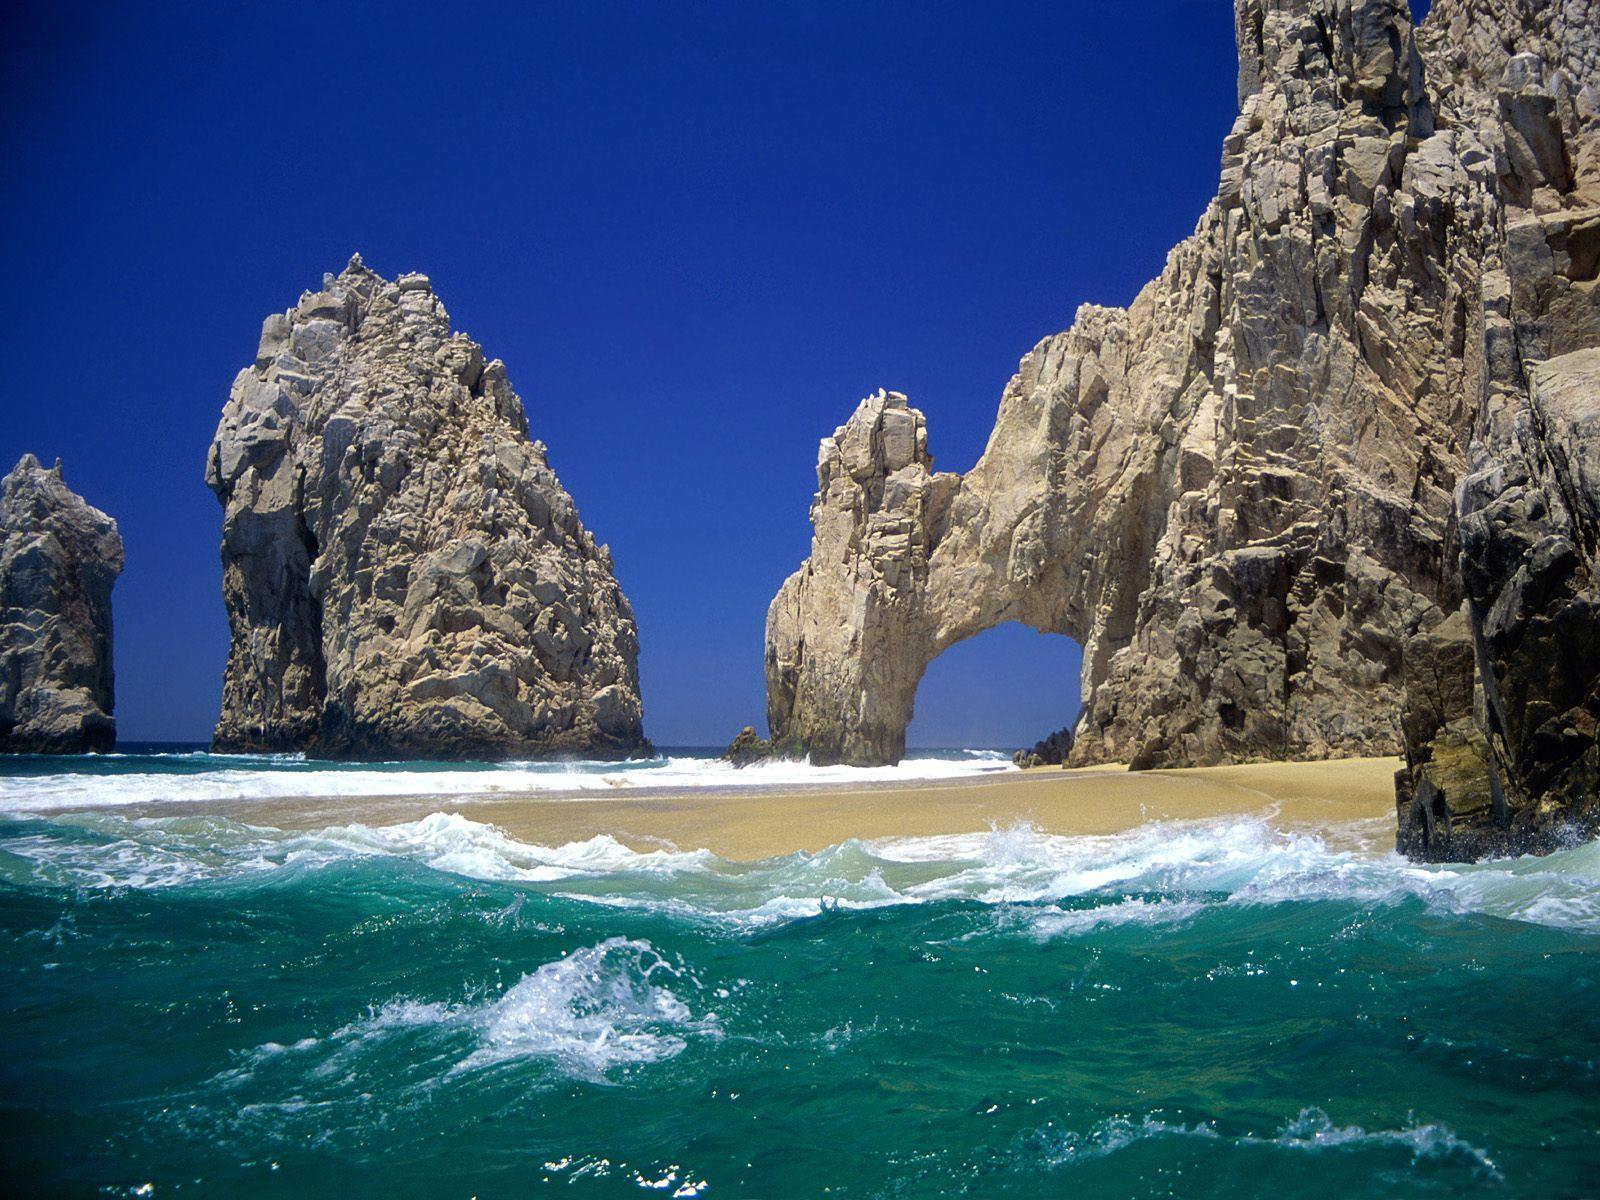 http://2.bp.blogspot.com/_BE2YXqXhrZ0/TRSYvIYfy6I/AAAAAAAABWk/5DEJ07P3DtU/s1600/Cabo-Beach-San-Lucas-Mexico.jpg